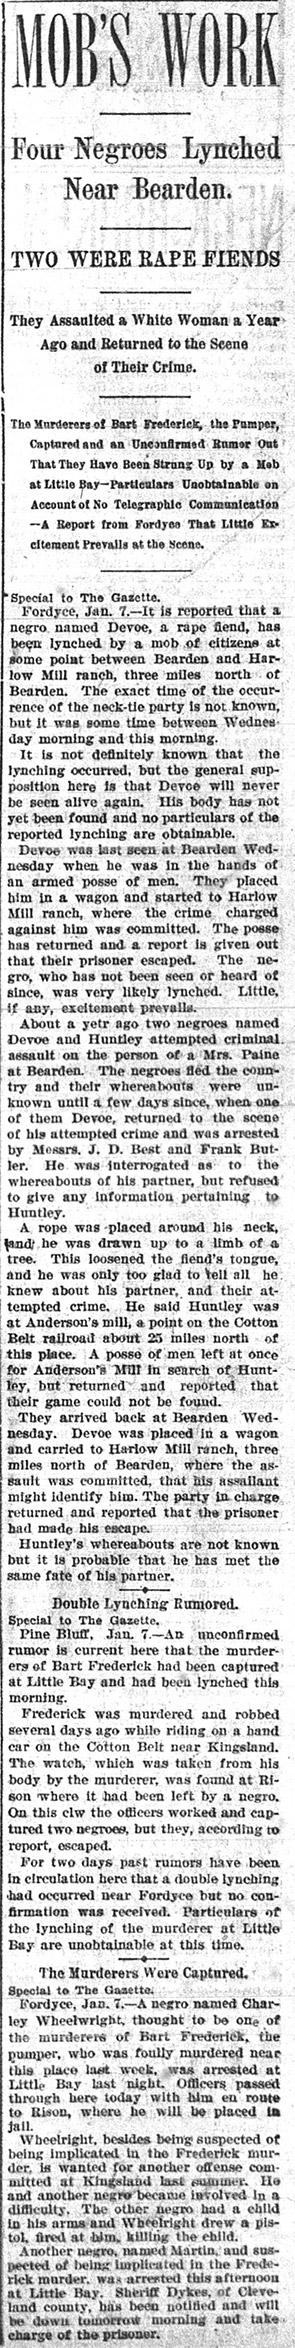 Devoe & Huntley Lynching Article